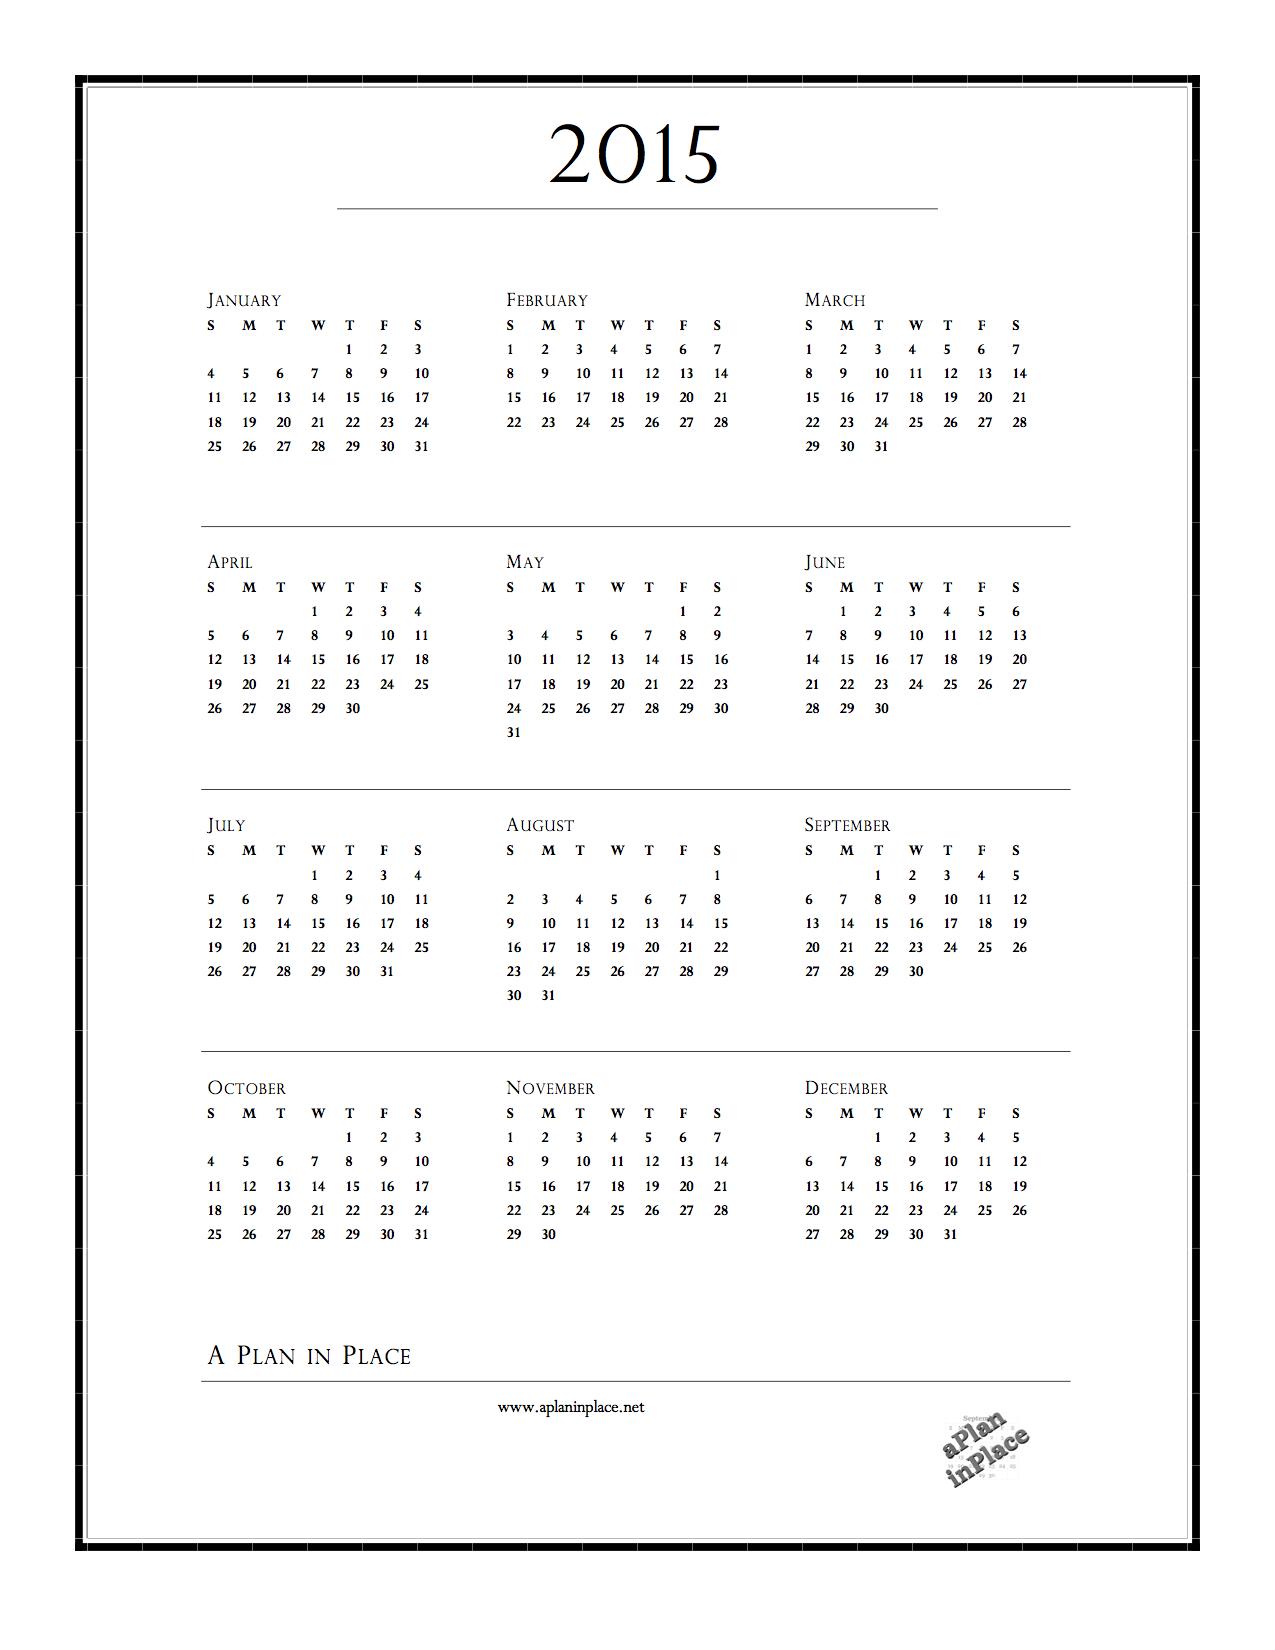 2015 Year at a Glance Printable